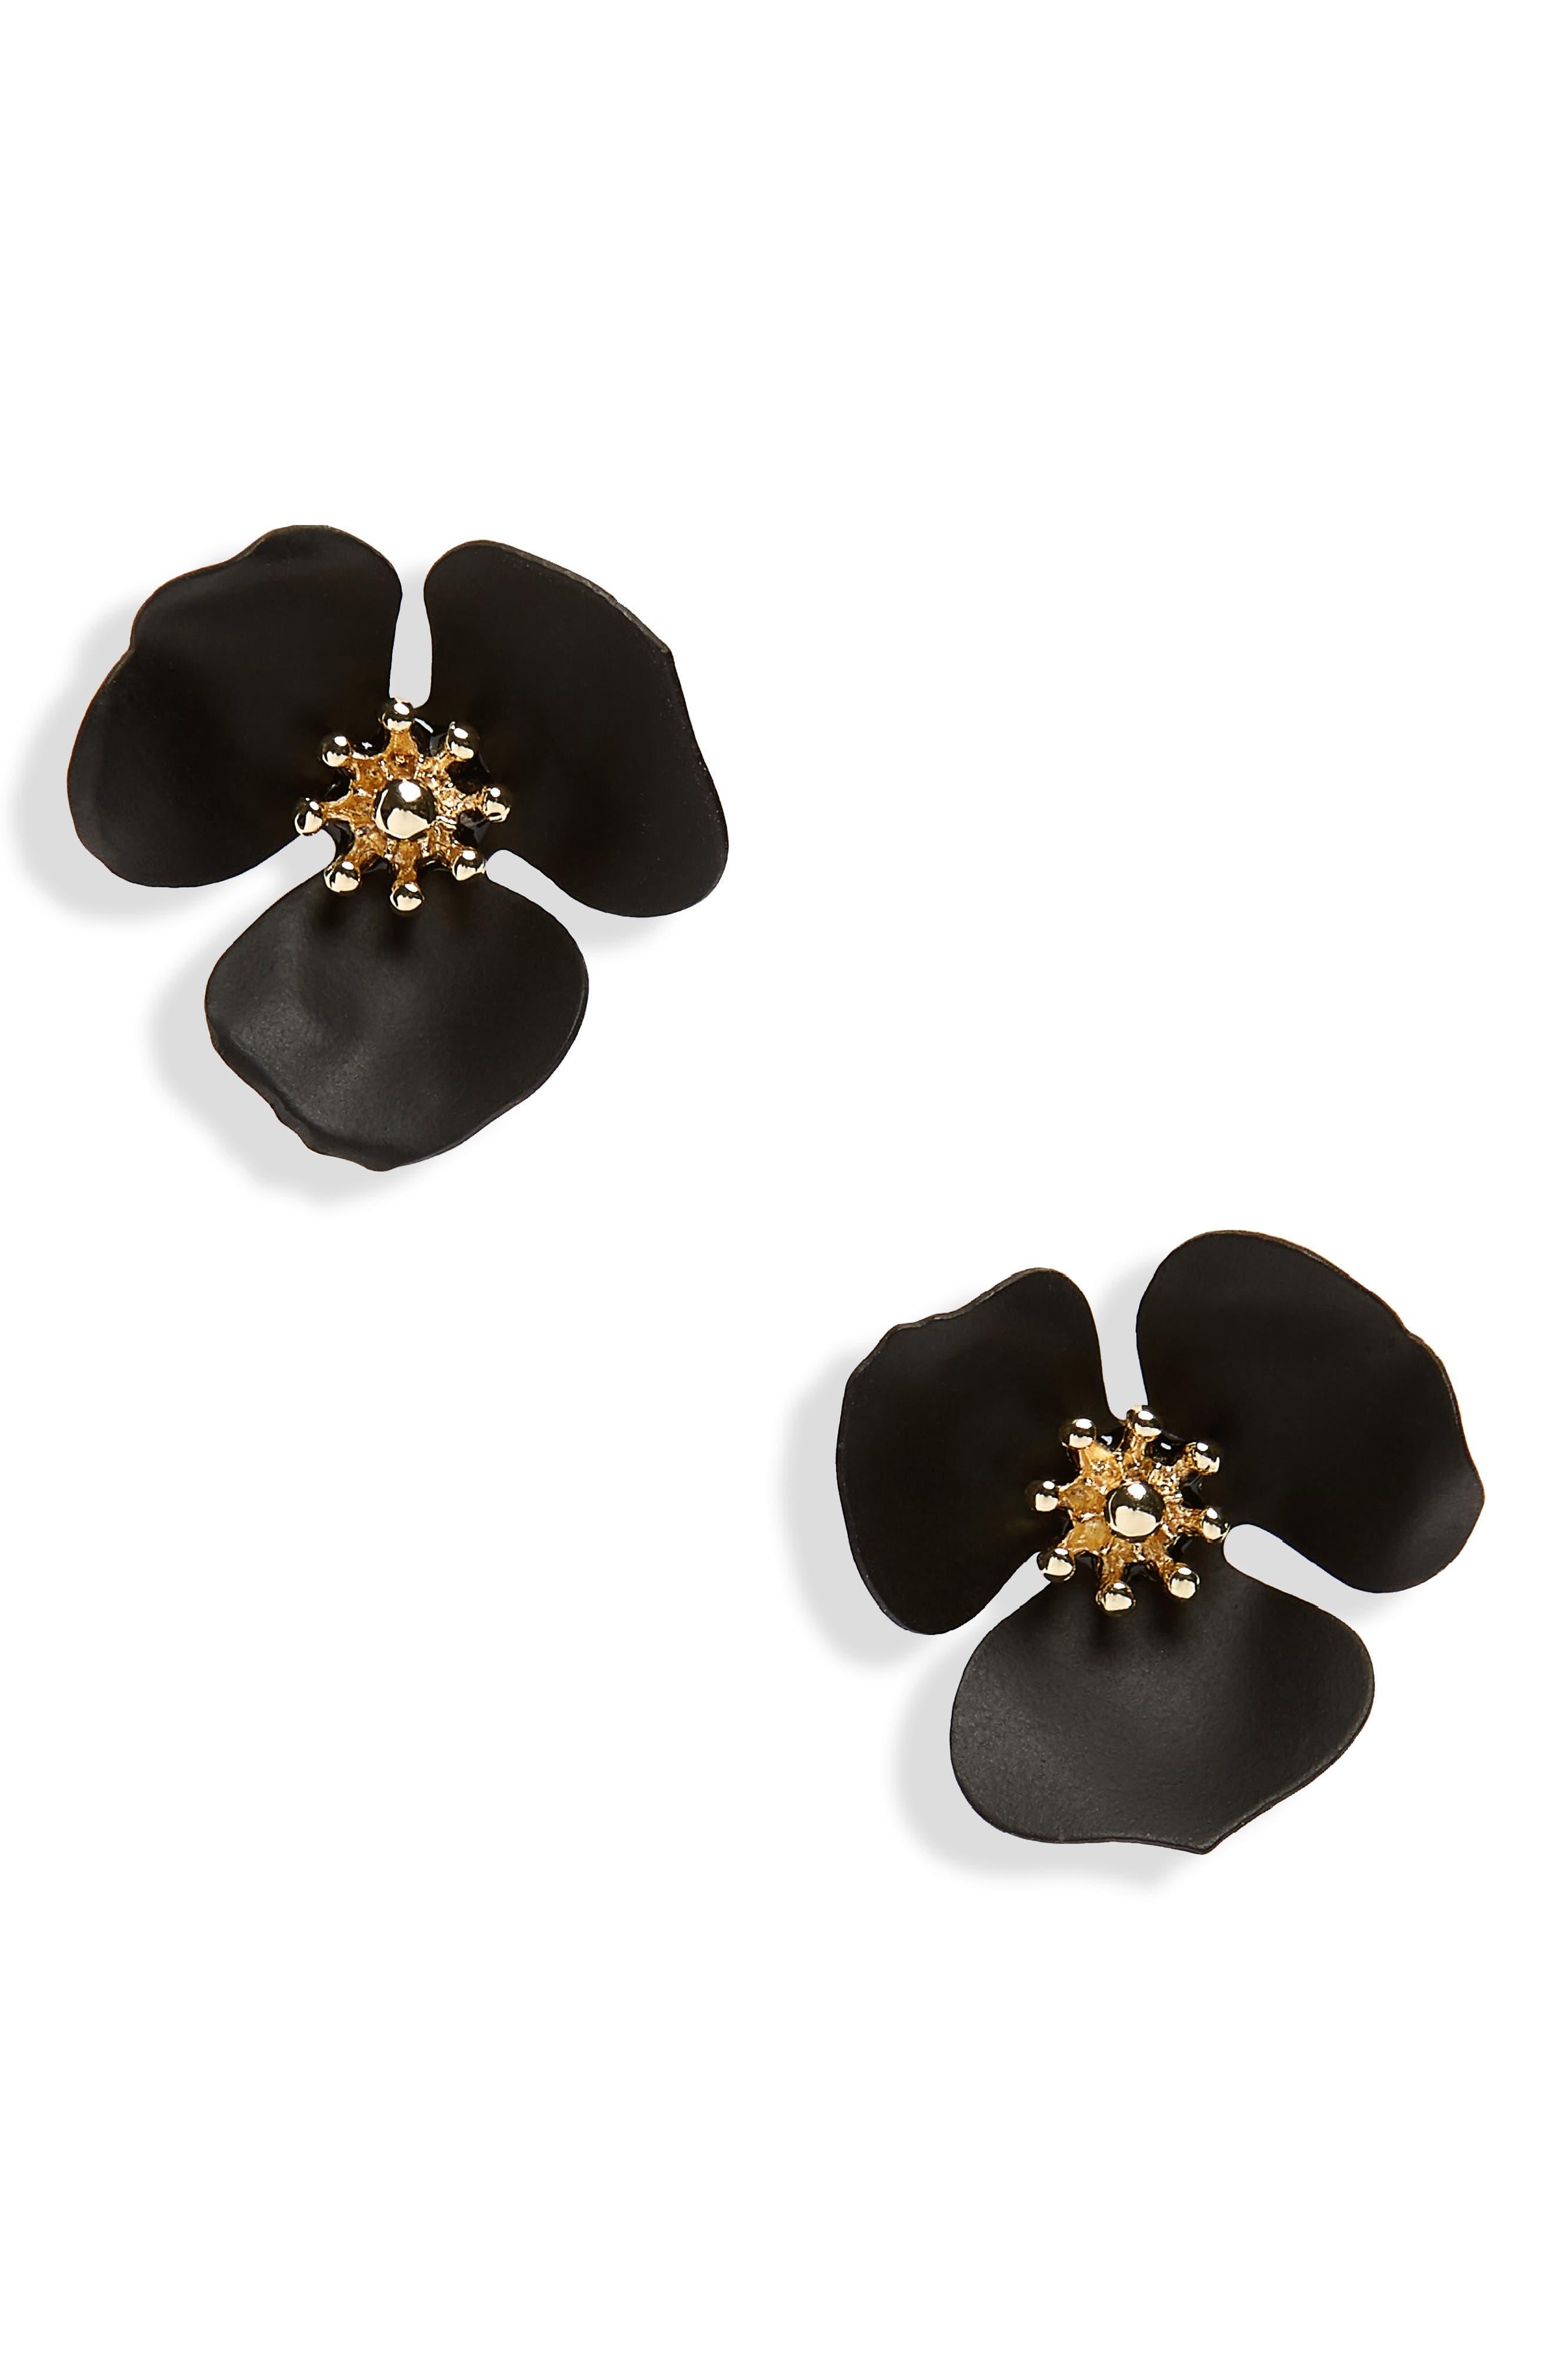 Lily Flower Stud Earrings,                             Main thumbnail 1, color,                             Black